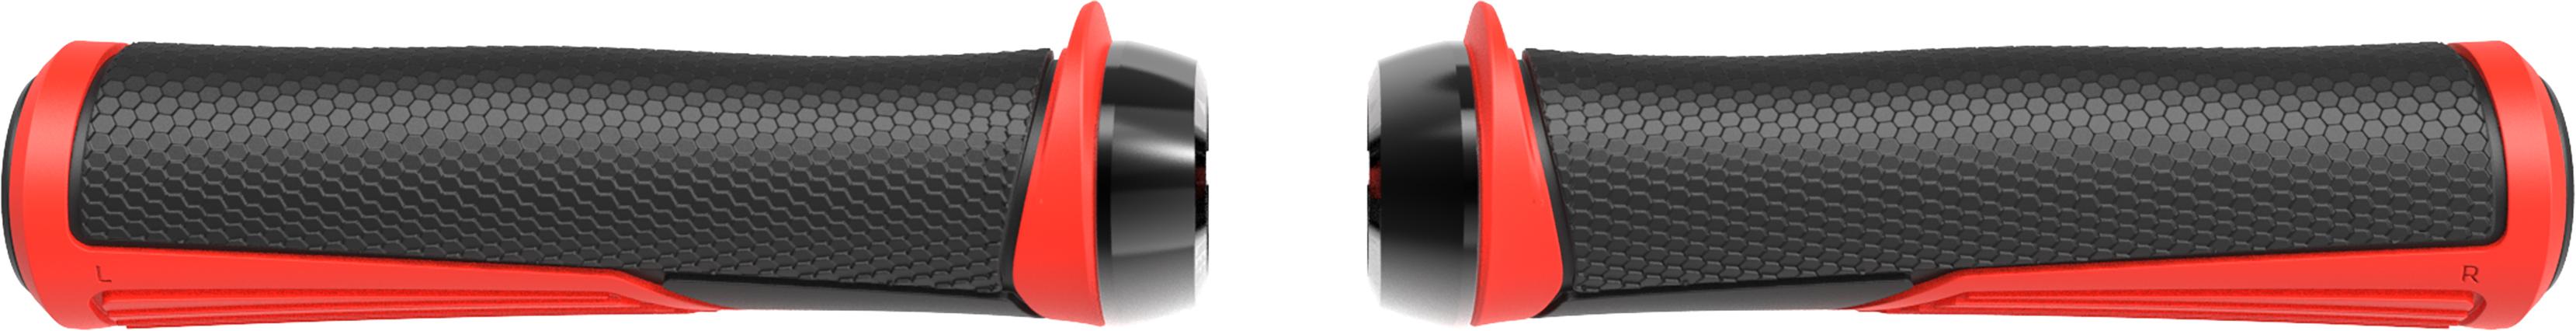 Грипсы BBB Cobra 142mm / red / lockring красный/черный, Рулевая группа - арт. 1022390362